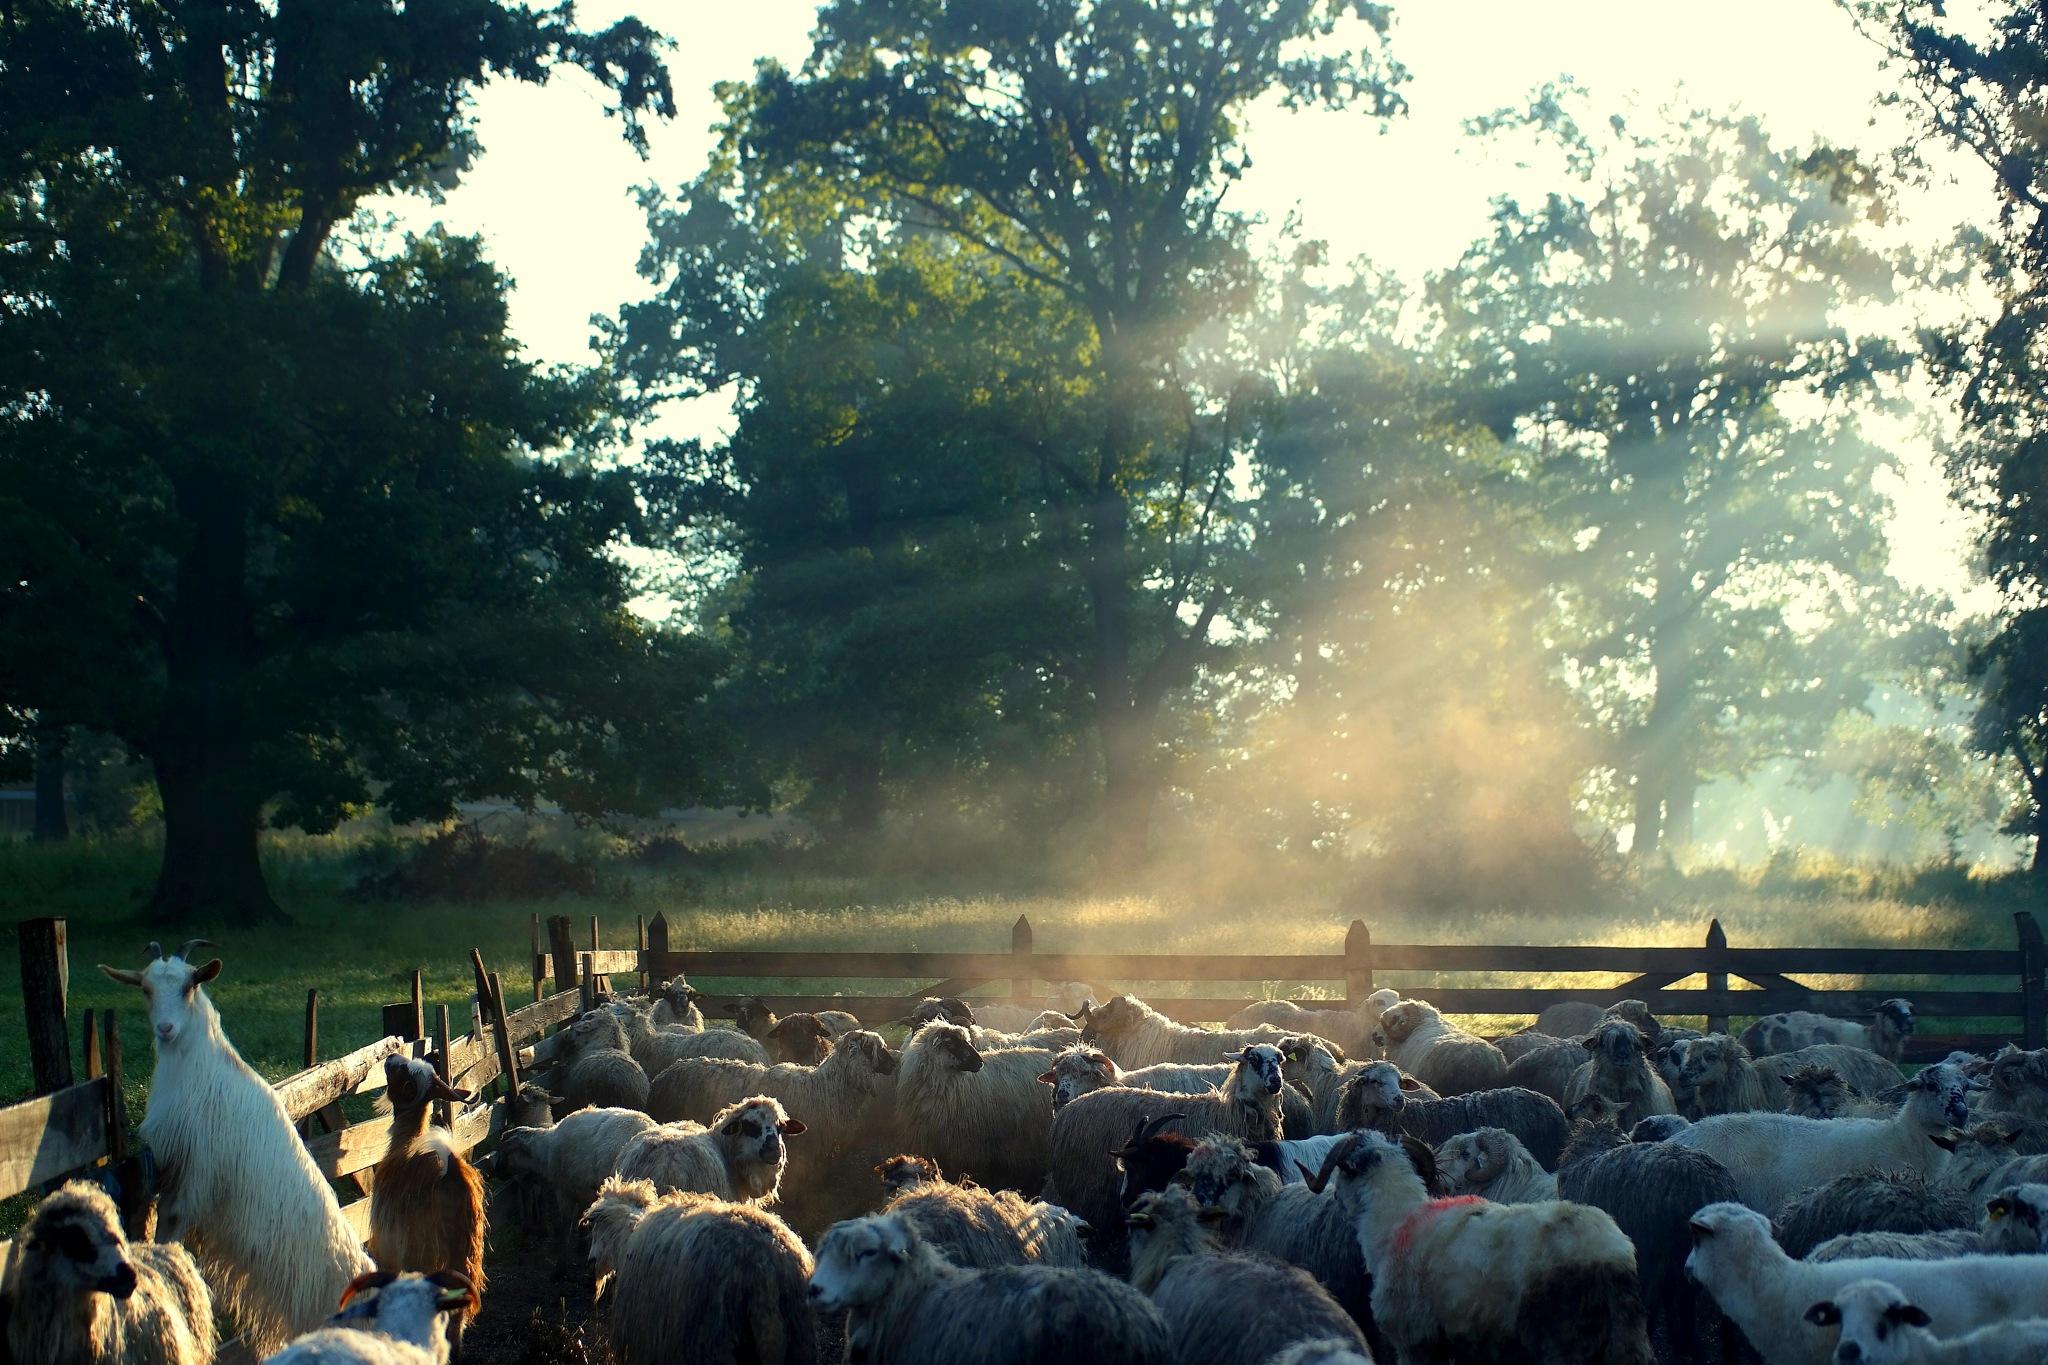 lighting sheepfold by rudragos